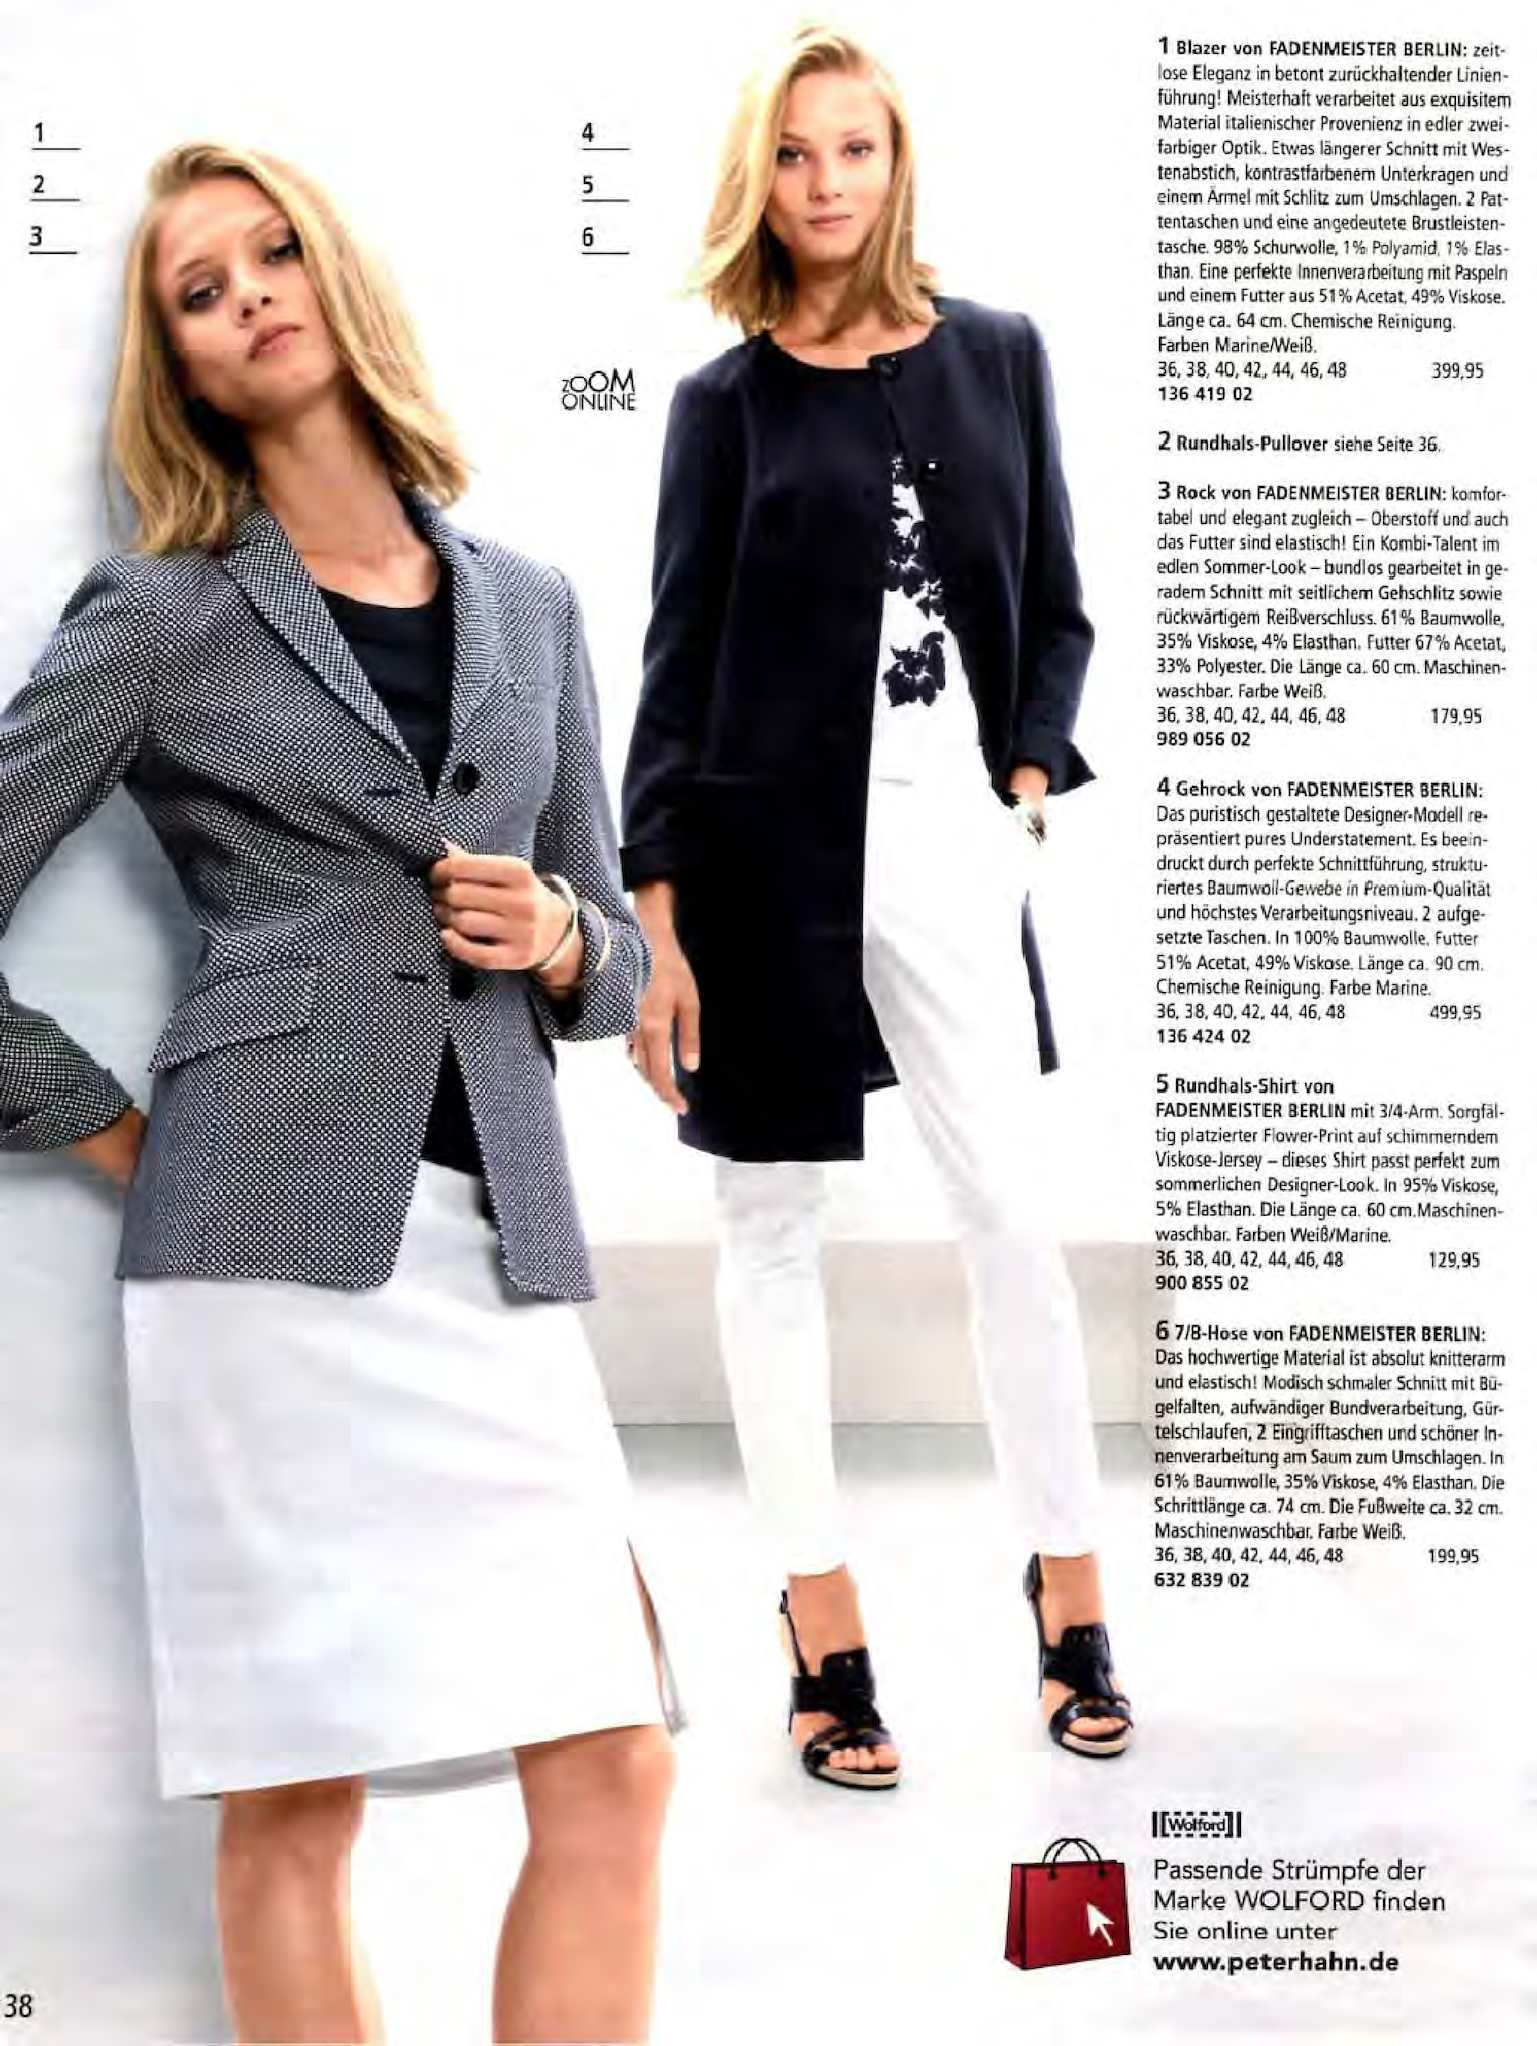 Damenmode Streifen 38 Revers Tailliert St.emile Damen Blazer Jacke Wollweiß Struktur